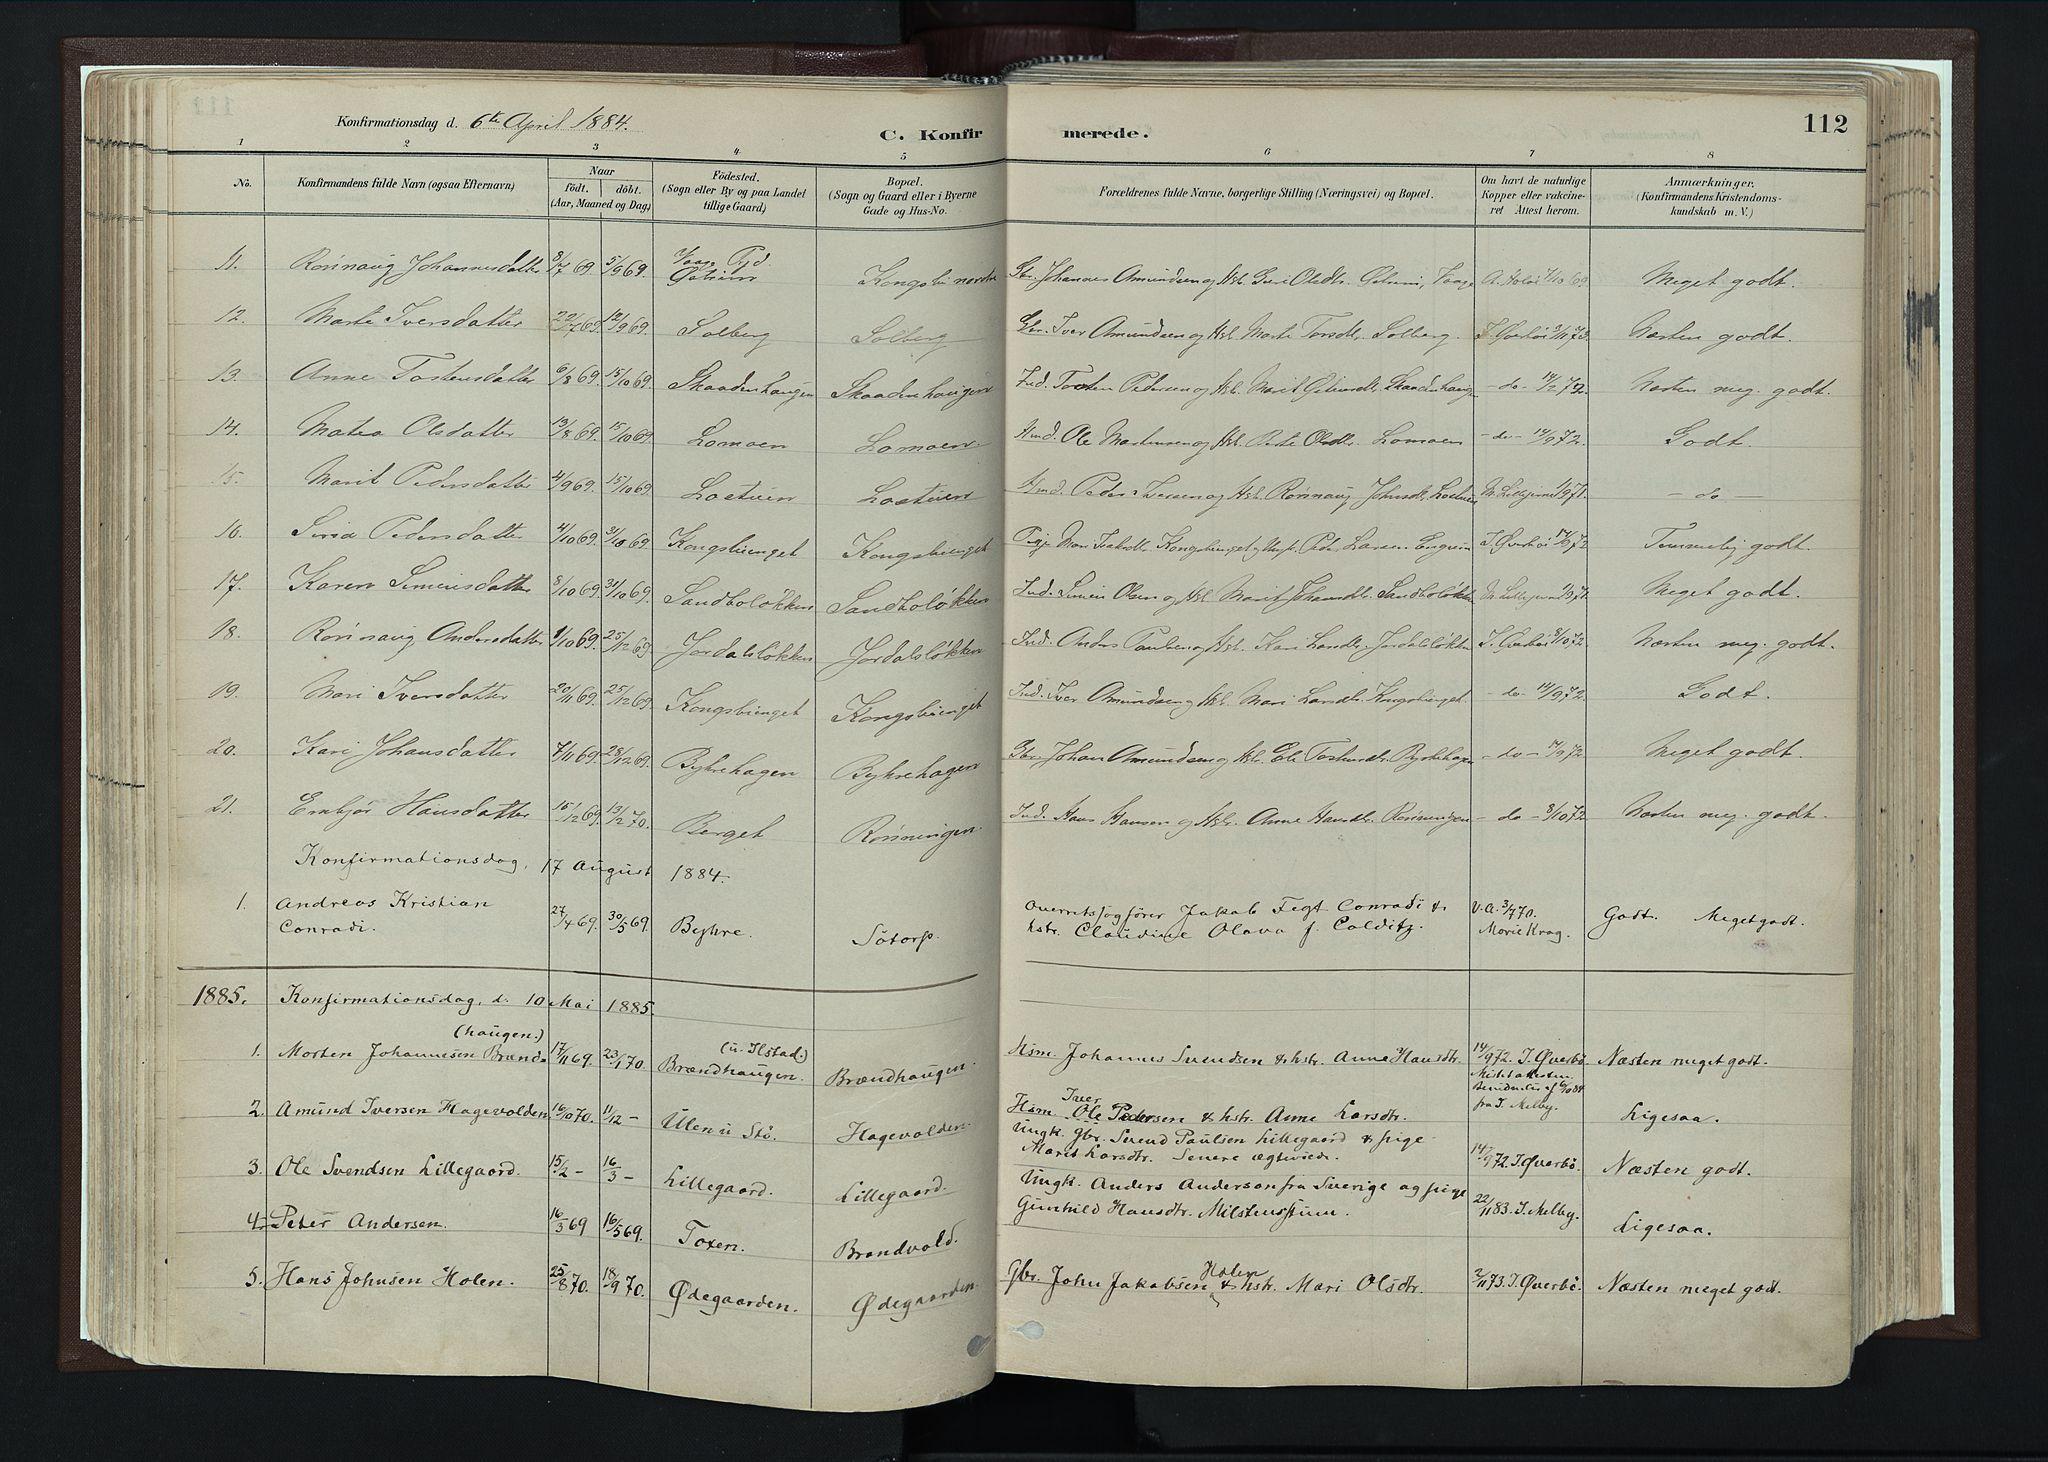 SAH, Nord-Fron prestekontor, Ministerialbok nr. 4, 1884-1914, s. 112